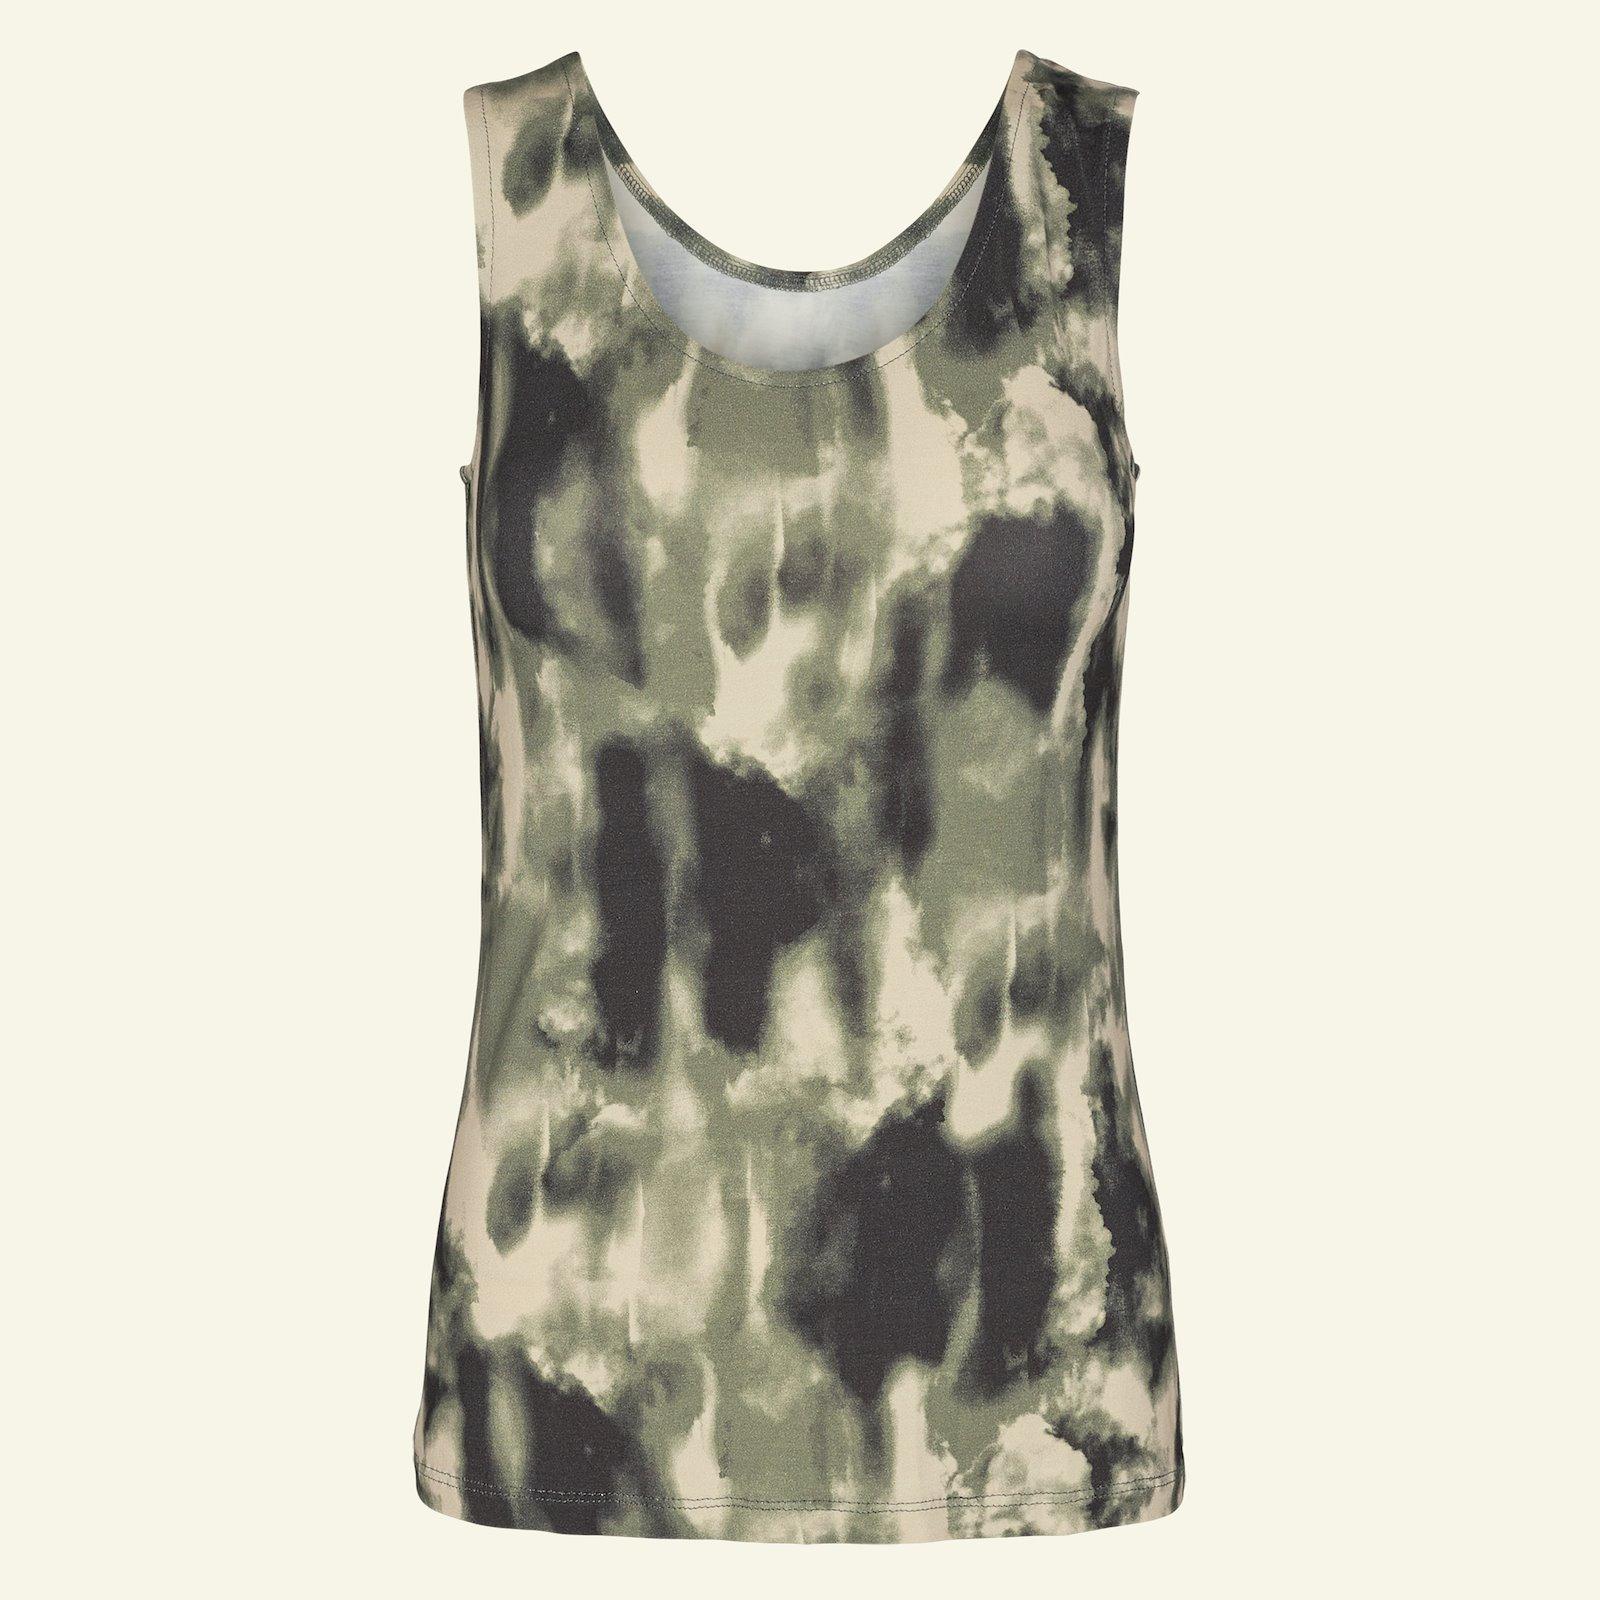 Top and dress, 42/14 p22071_272691_sskit